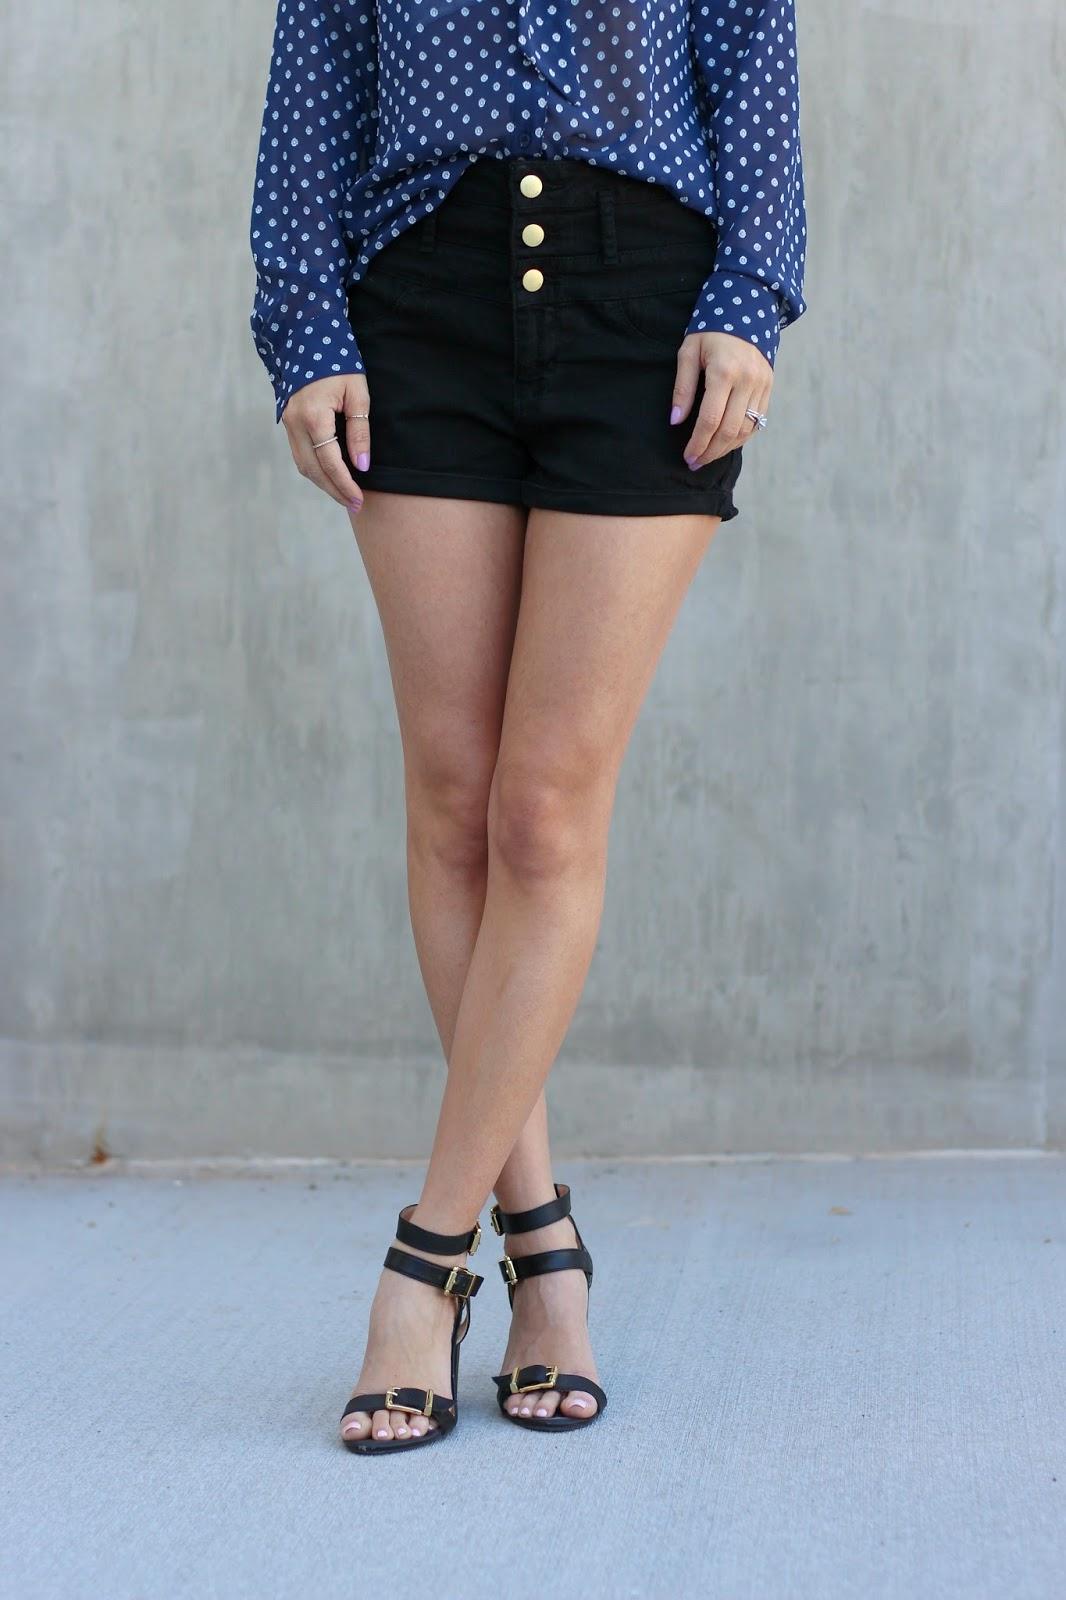 polka dot maison jules top, charlotte russe shorts